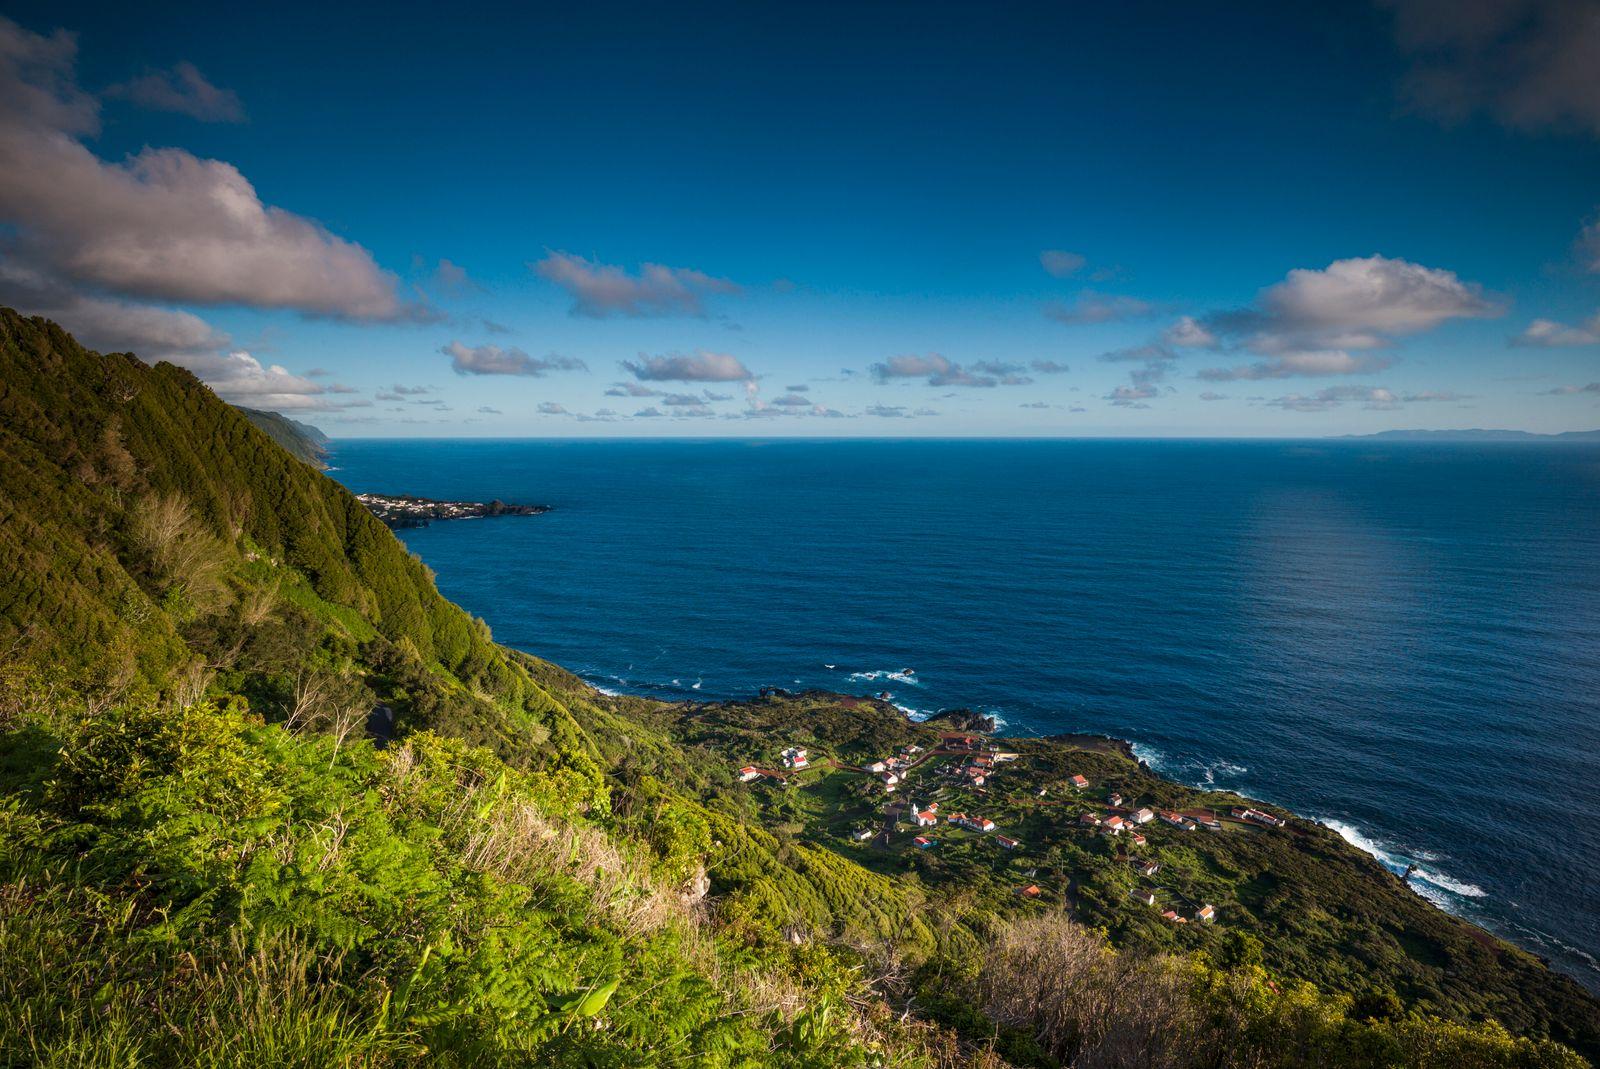 Portugal, Azores, Sao Jorge Island, Faja da Ribeira da Areia, elevated view. (Walter Bibikow)